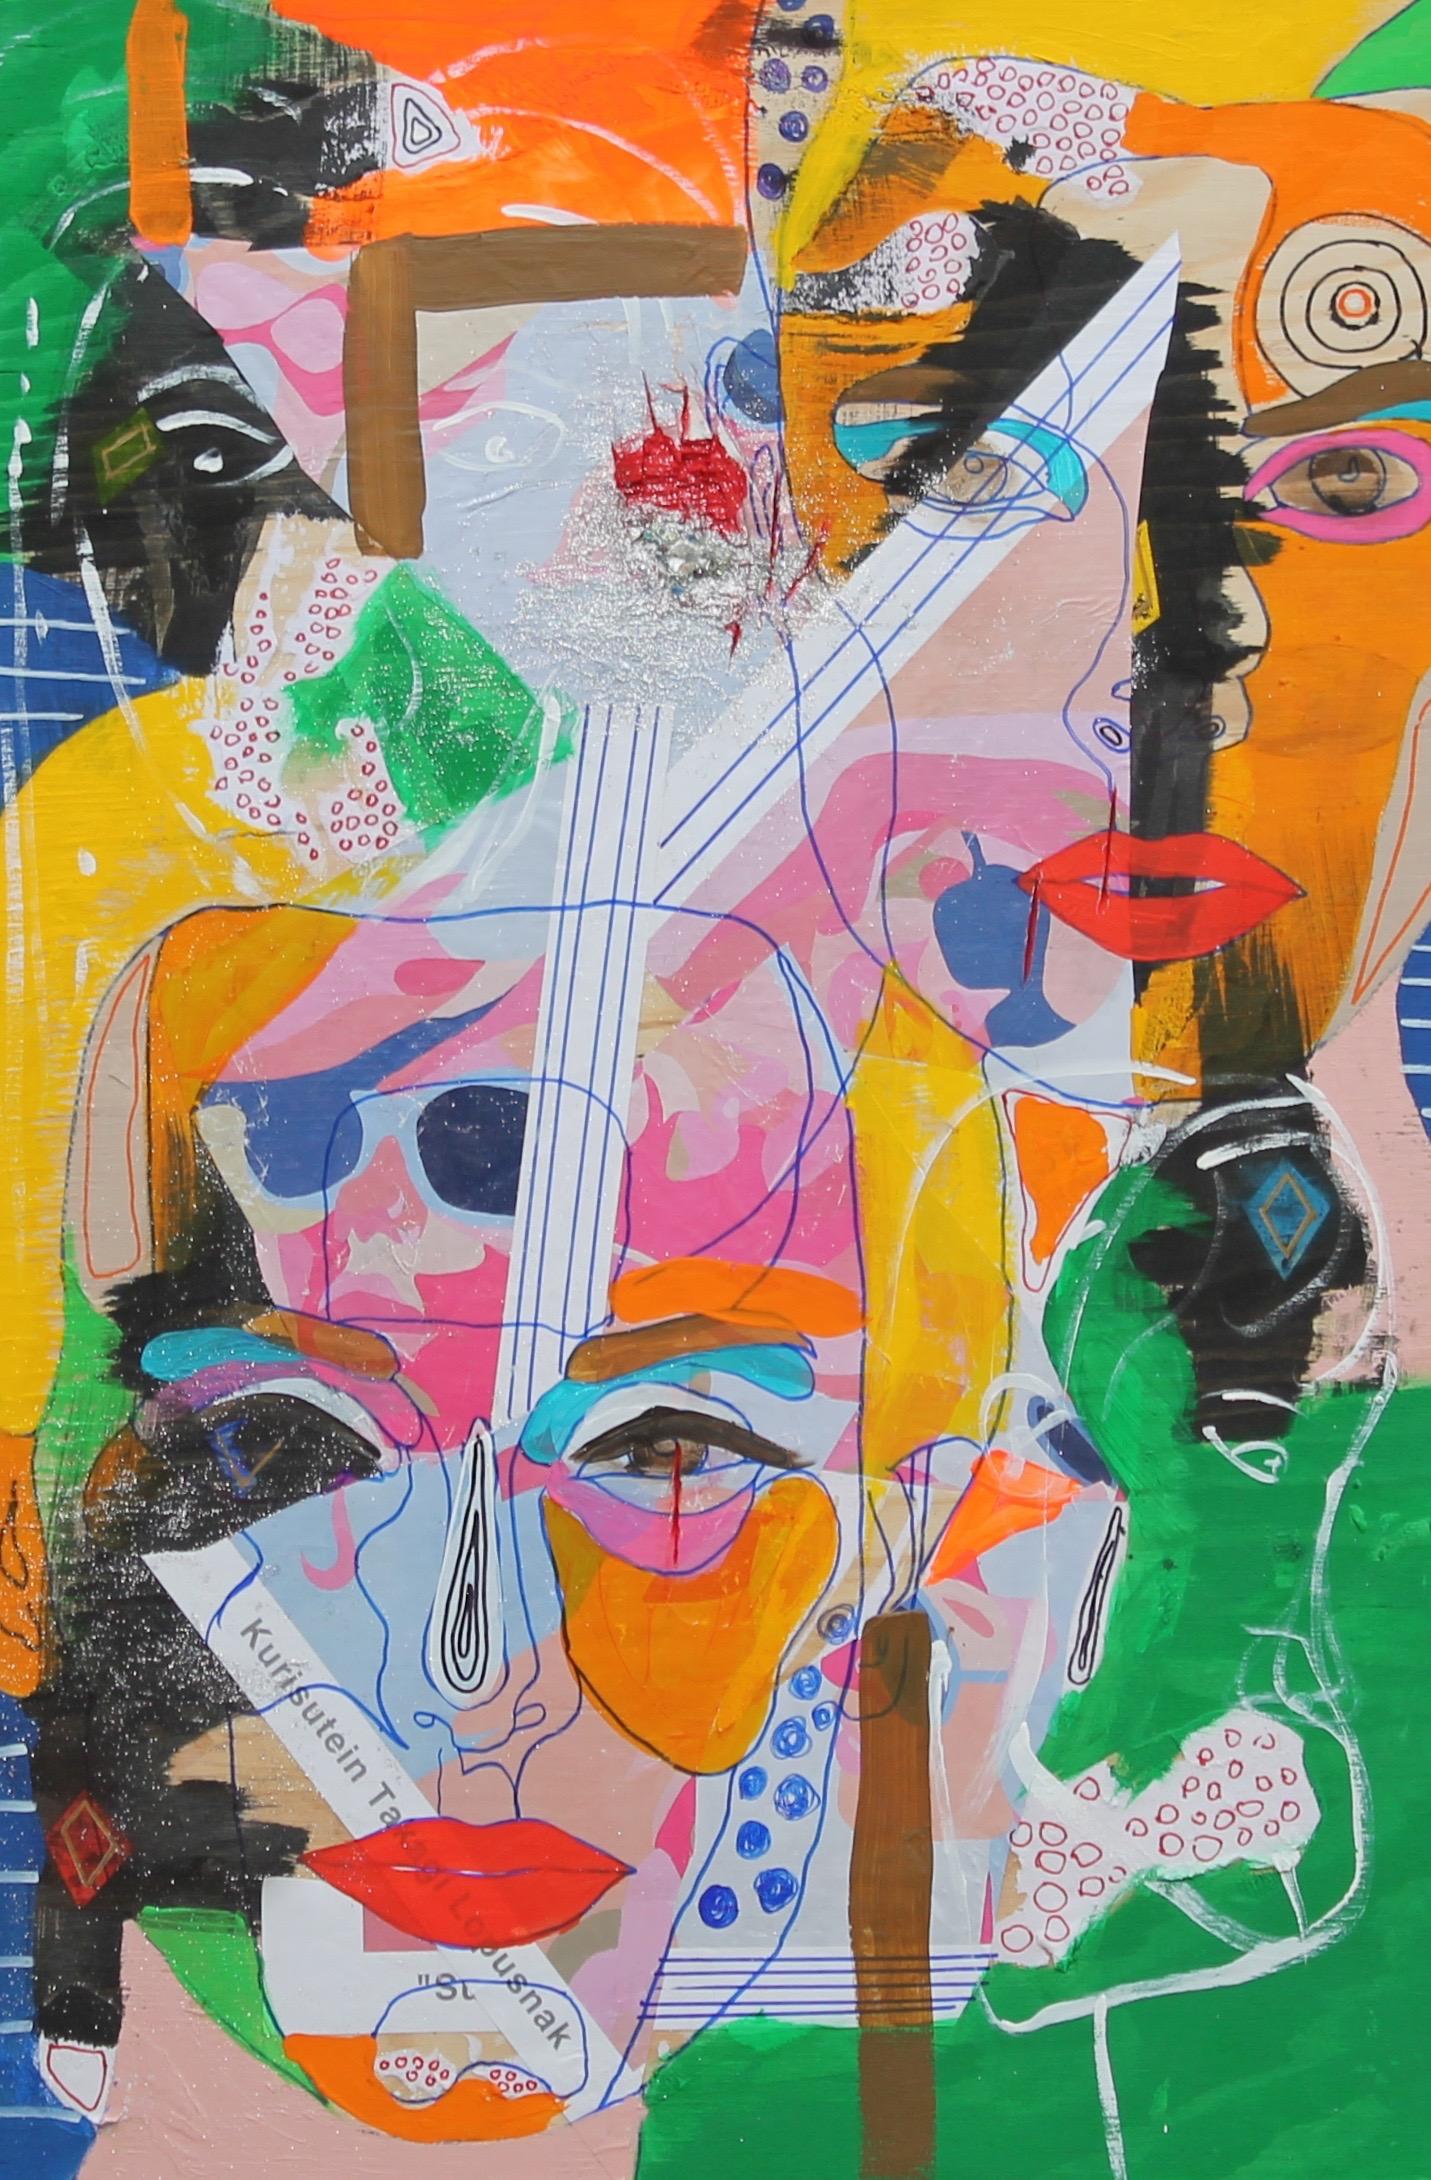 Title: Listen to Sugar Medium: Acrylic, gouache, ink, marker, paper, rhinestones, glitter Size: 24x36